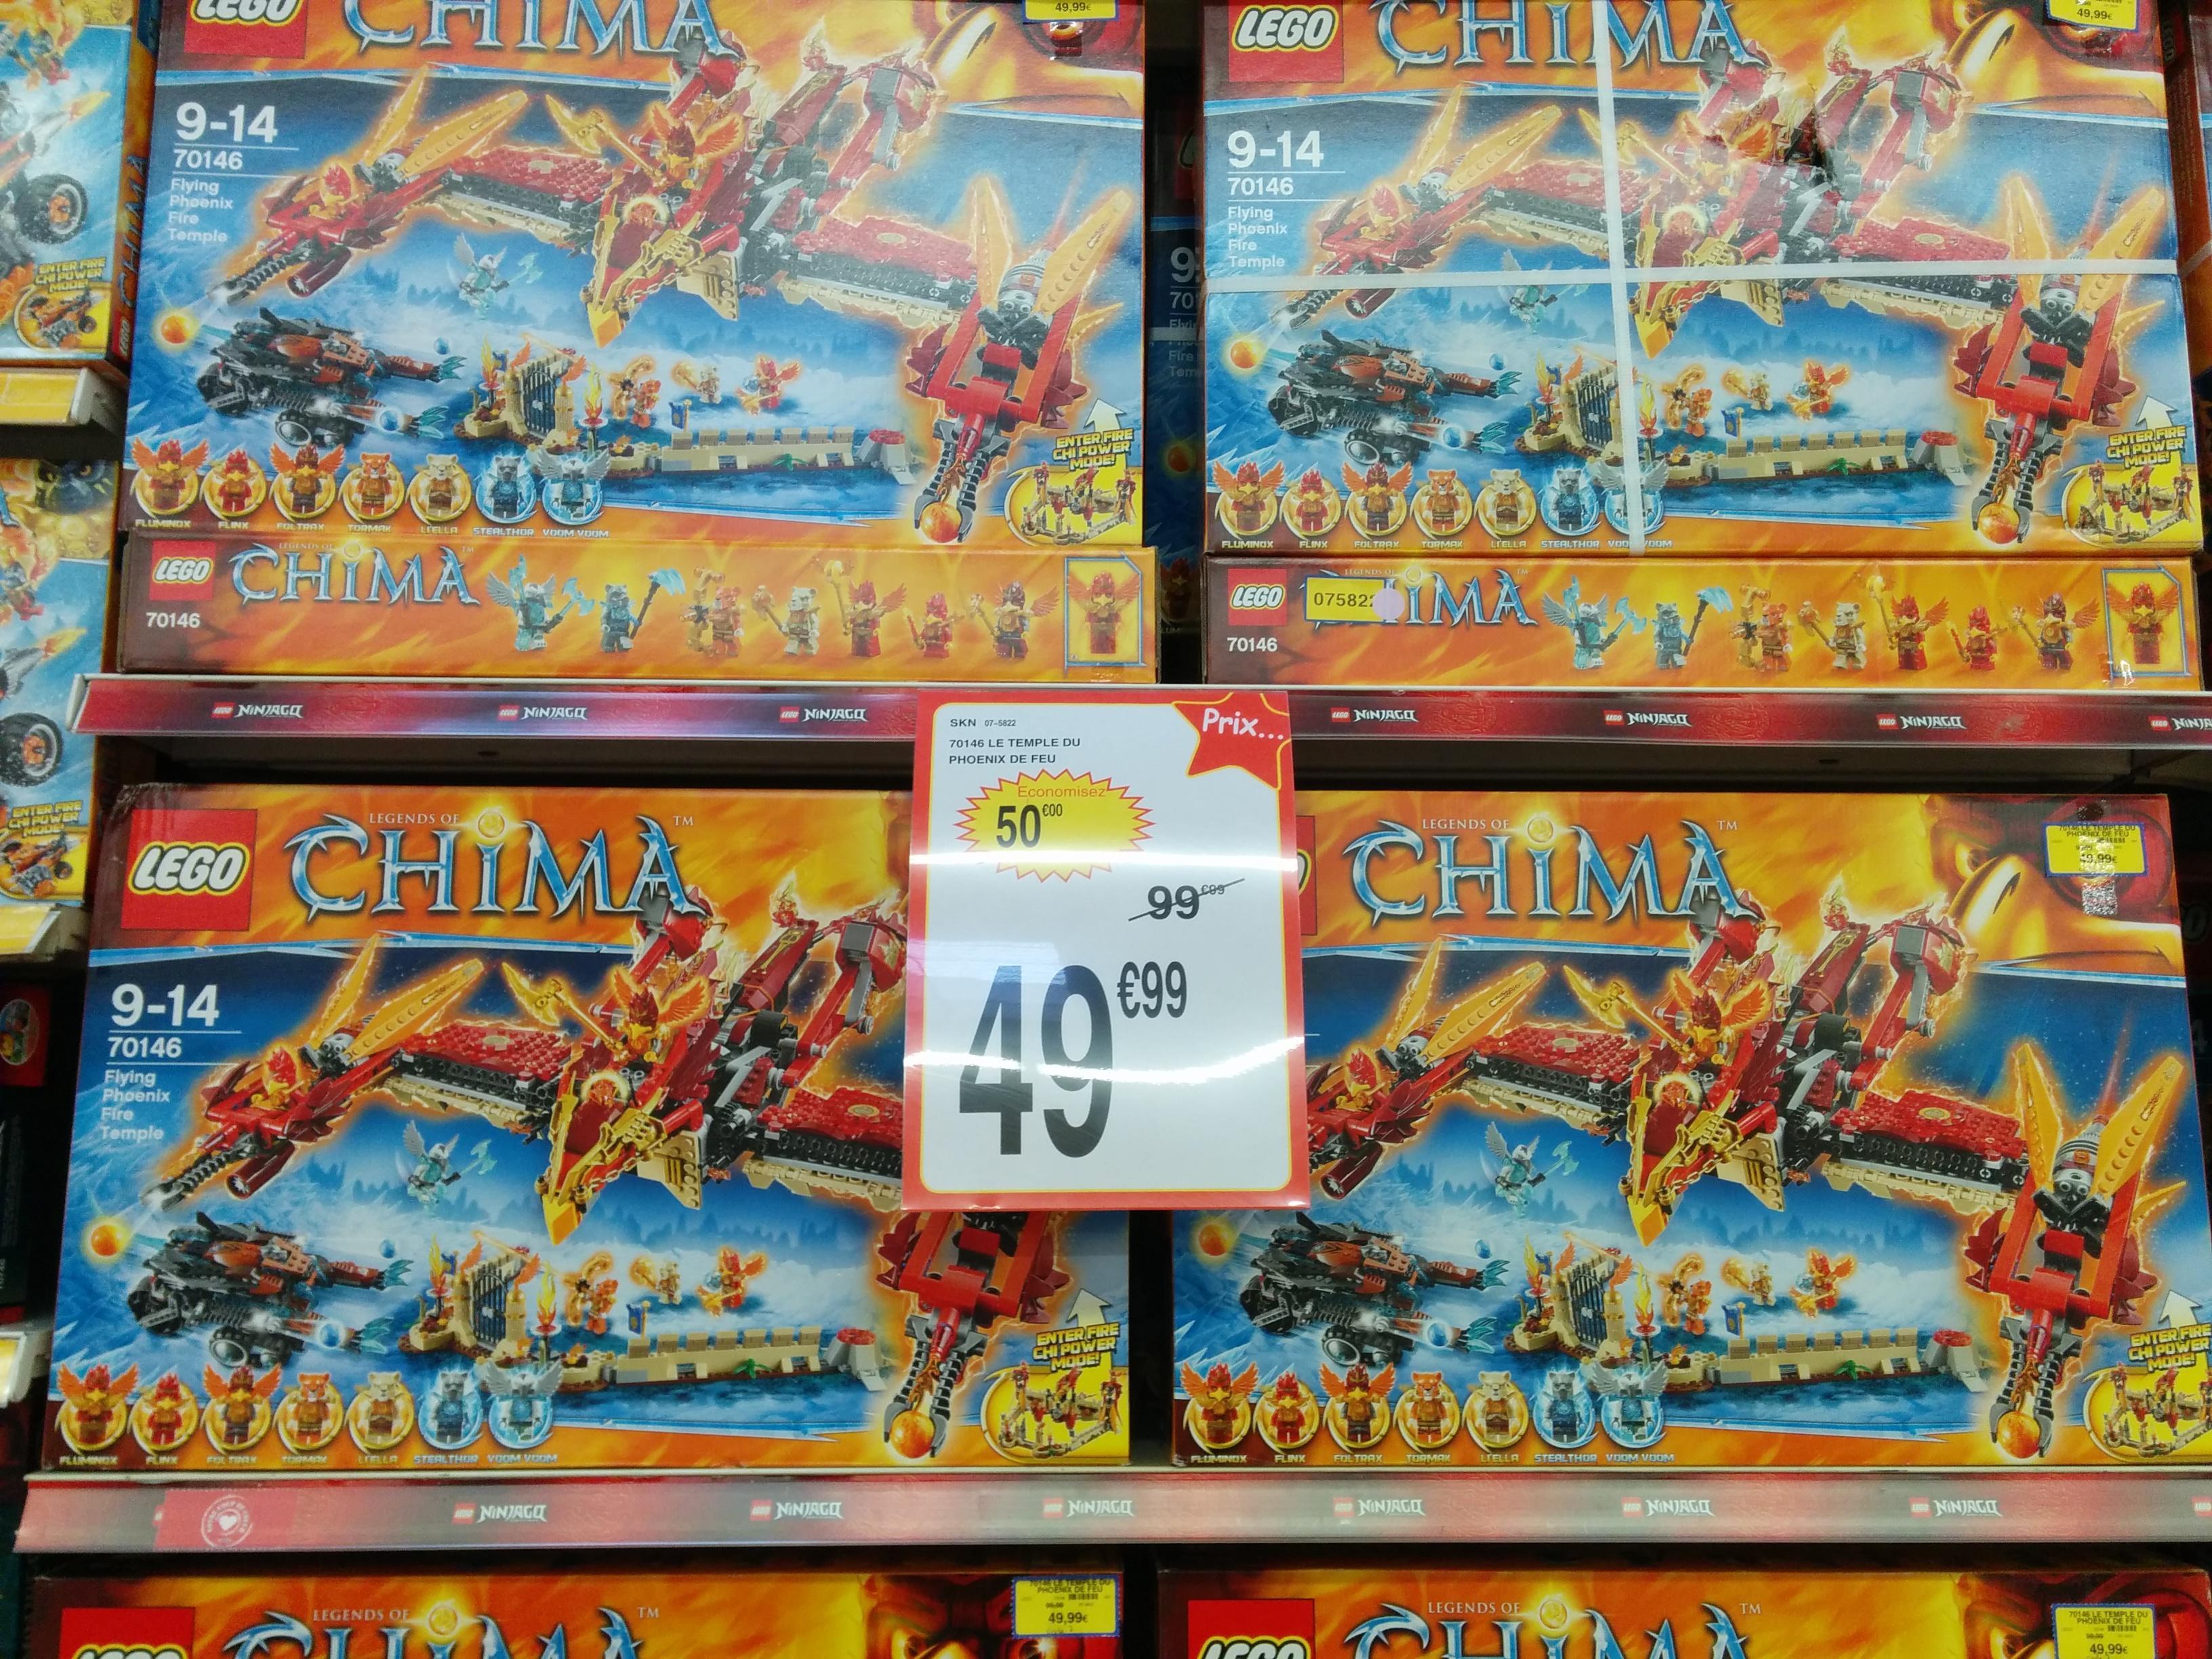 Lego Chima 70146 - Le temple du Phoenix de Feu